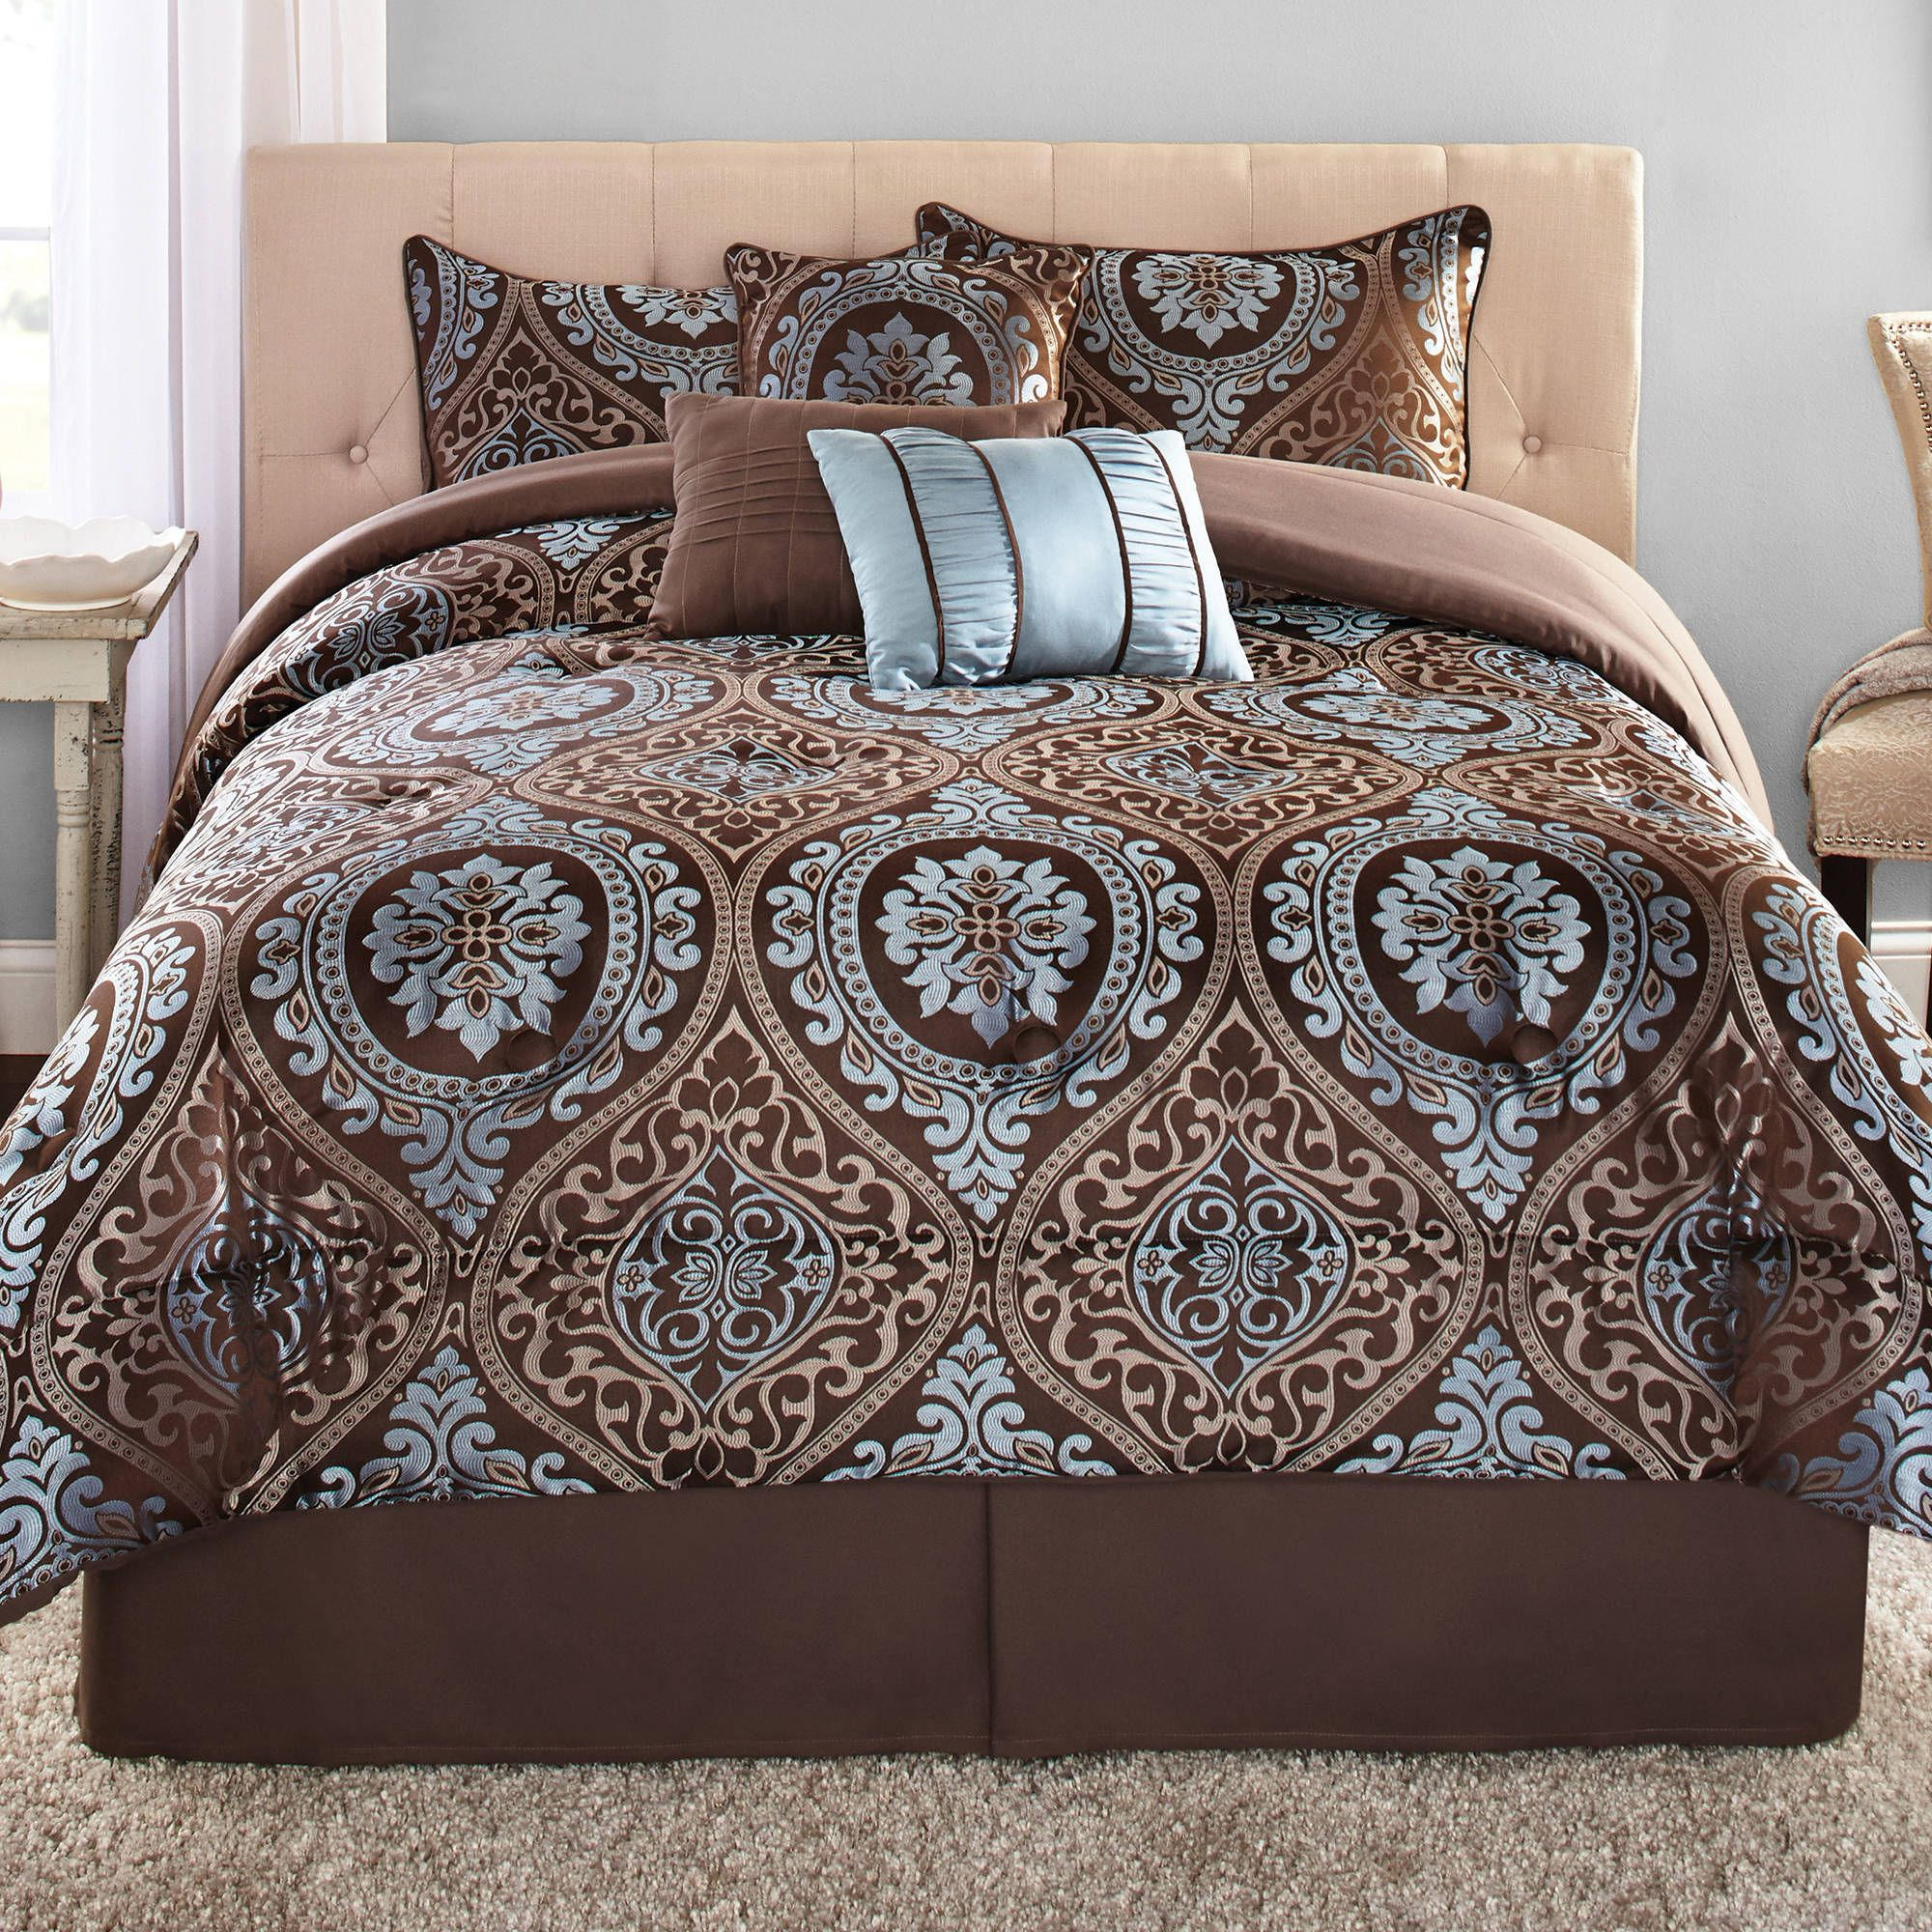 Mainstays Victoria Jacquard Brown 7 Piece Comforter Set King Walmart Com Jacquard Bedding Comforter Sets Bed Comforters